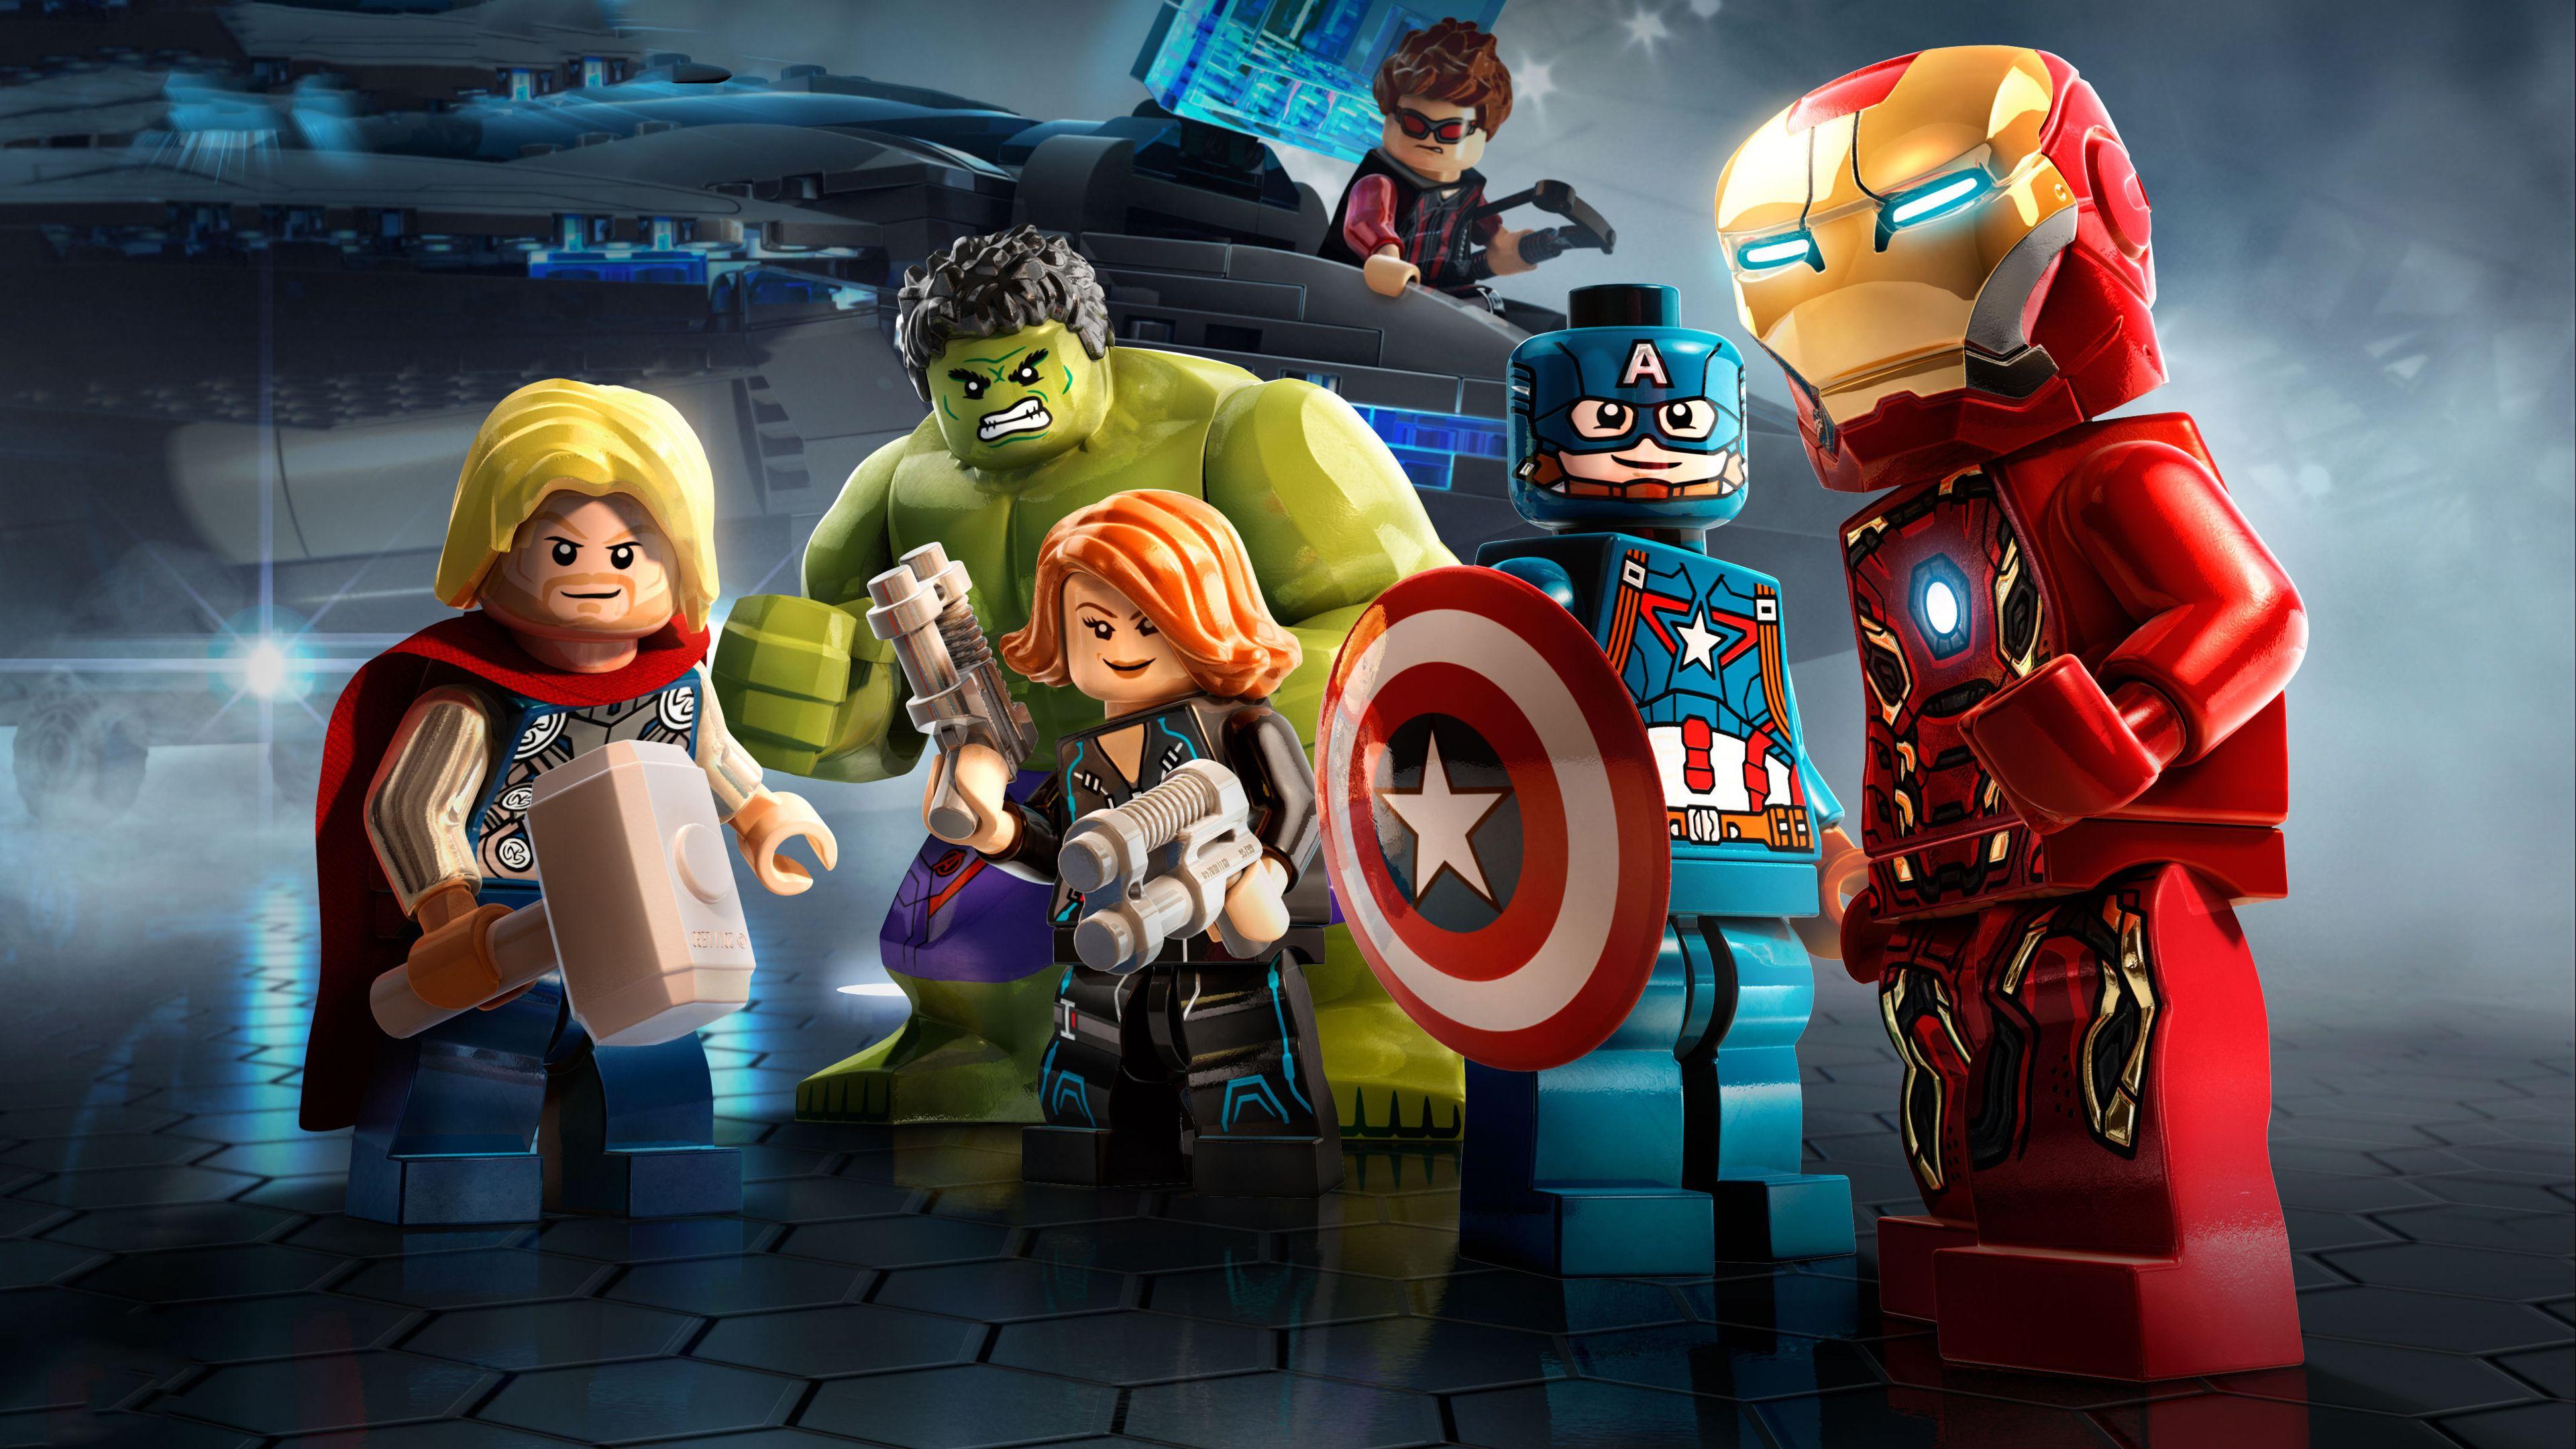 Marvel Avengers Lego 4k superheroes wallpapers lego wallpapers 3840x2160